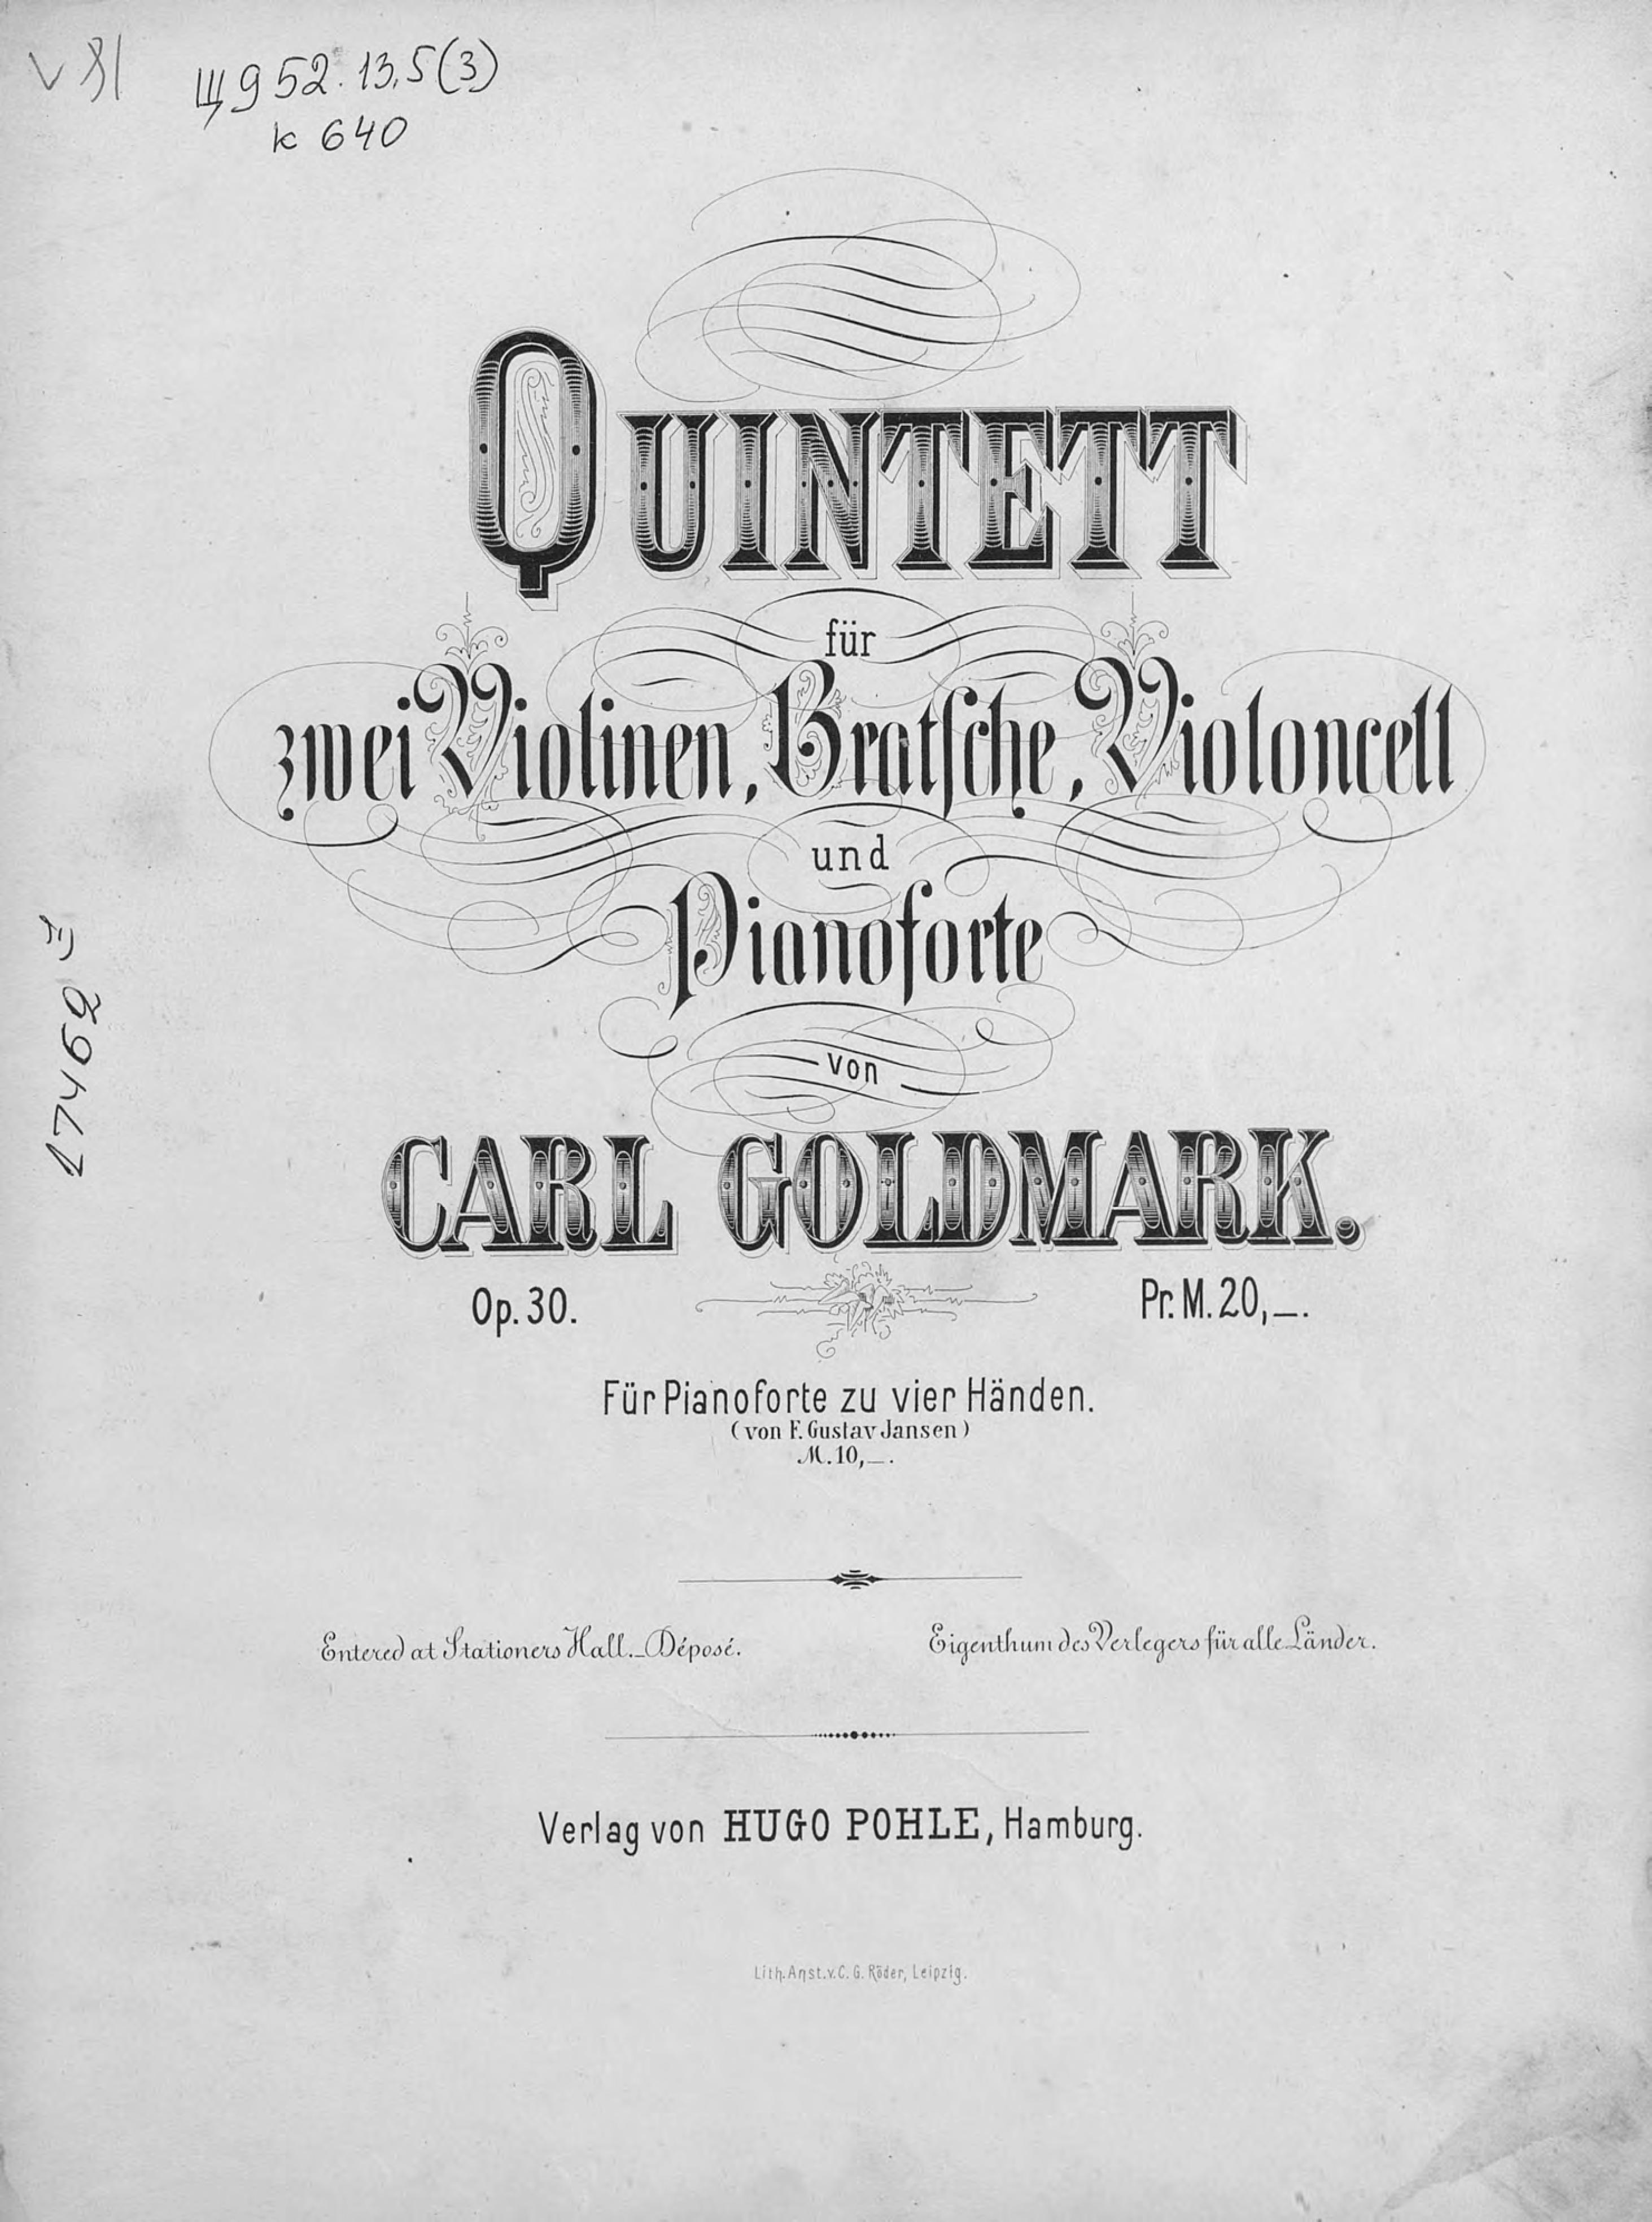 Карл Гольдмарк Quintett fur 2 Violinen, Bratsche, Violoncell und Pianoforte v. Carl Goldmark джузеппе верди quartett fur 2 violinen viola und violoncell v g verdi e moll